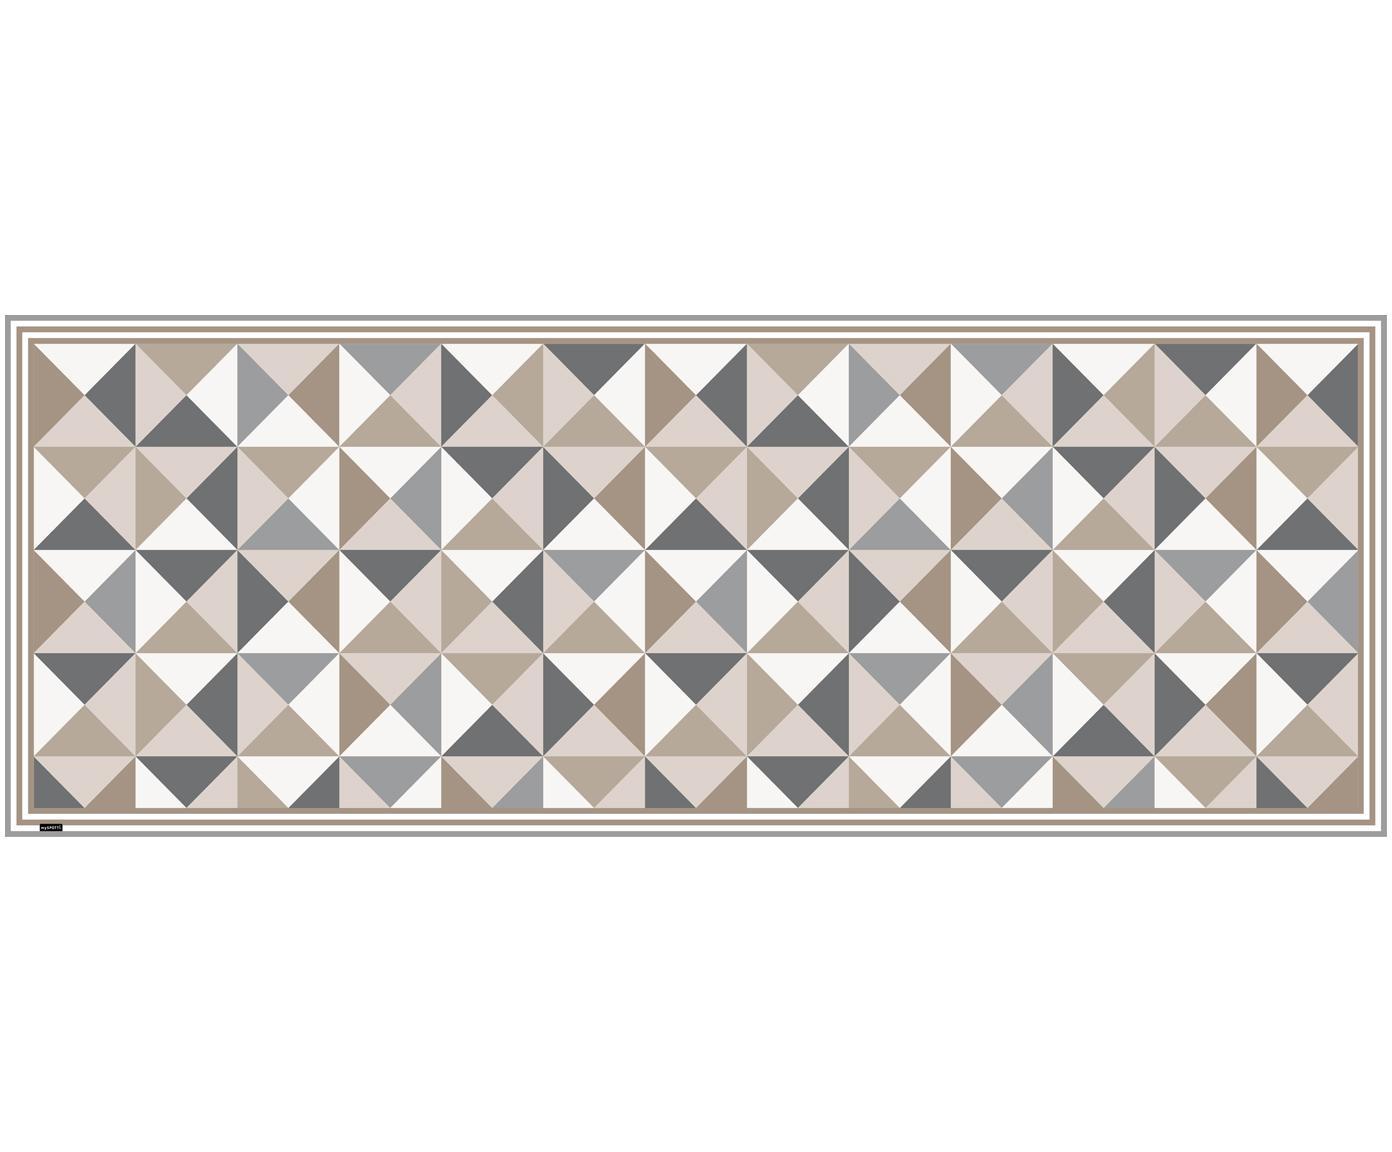 Alfombra vinílica Haakon, Vinilo, reciclable, Gris, tonos beige, blanco, An 68 x L 180 cm